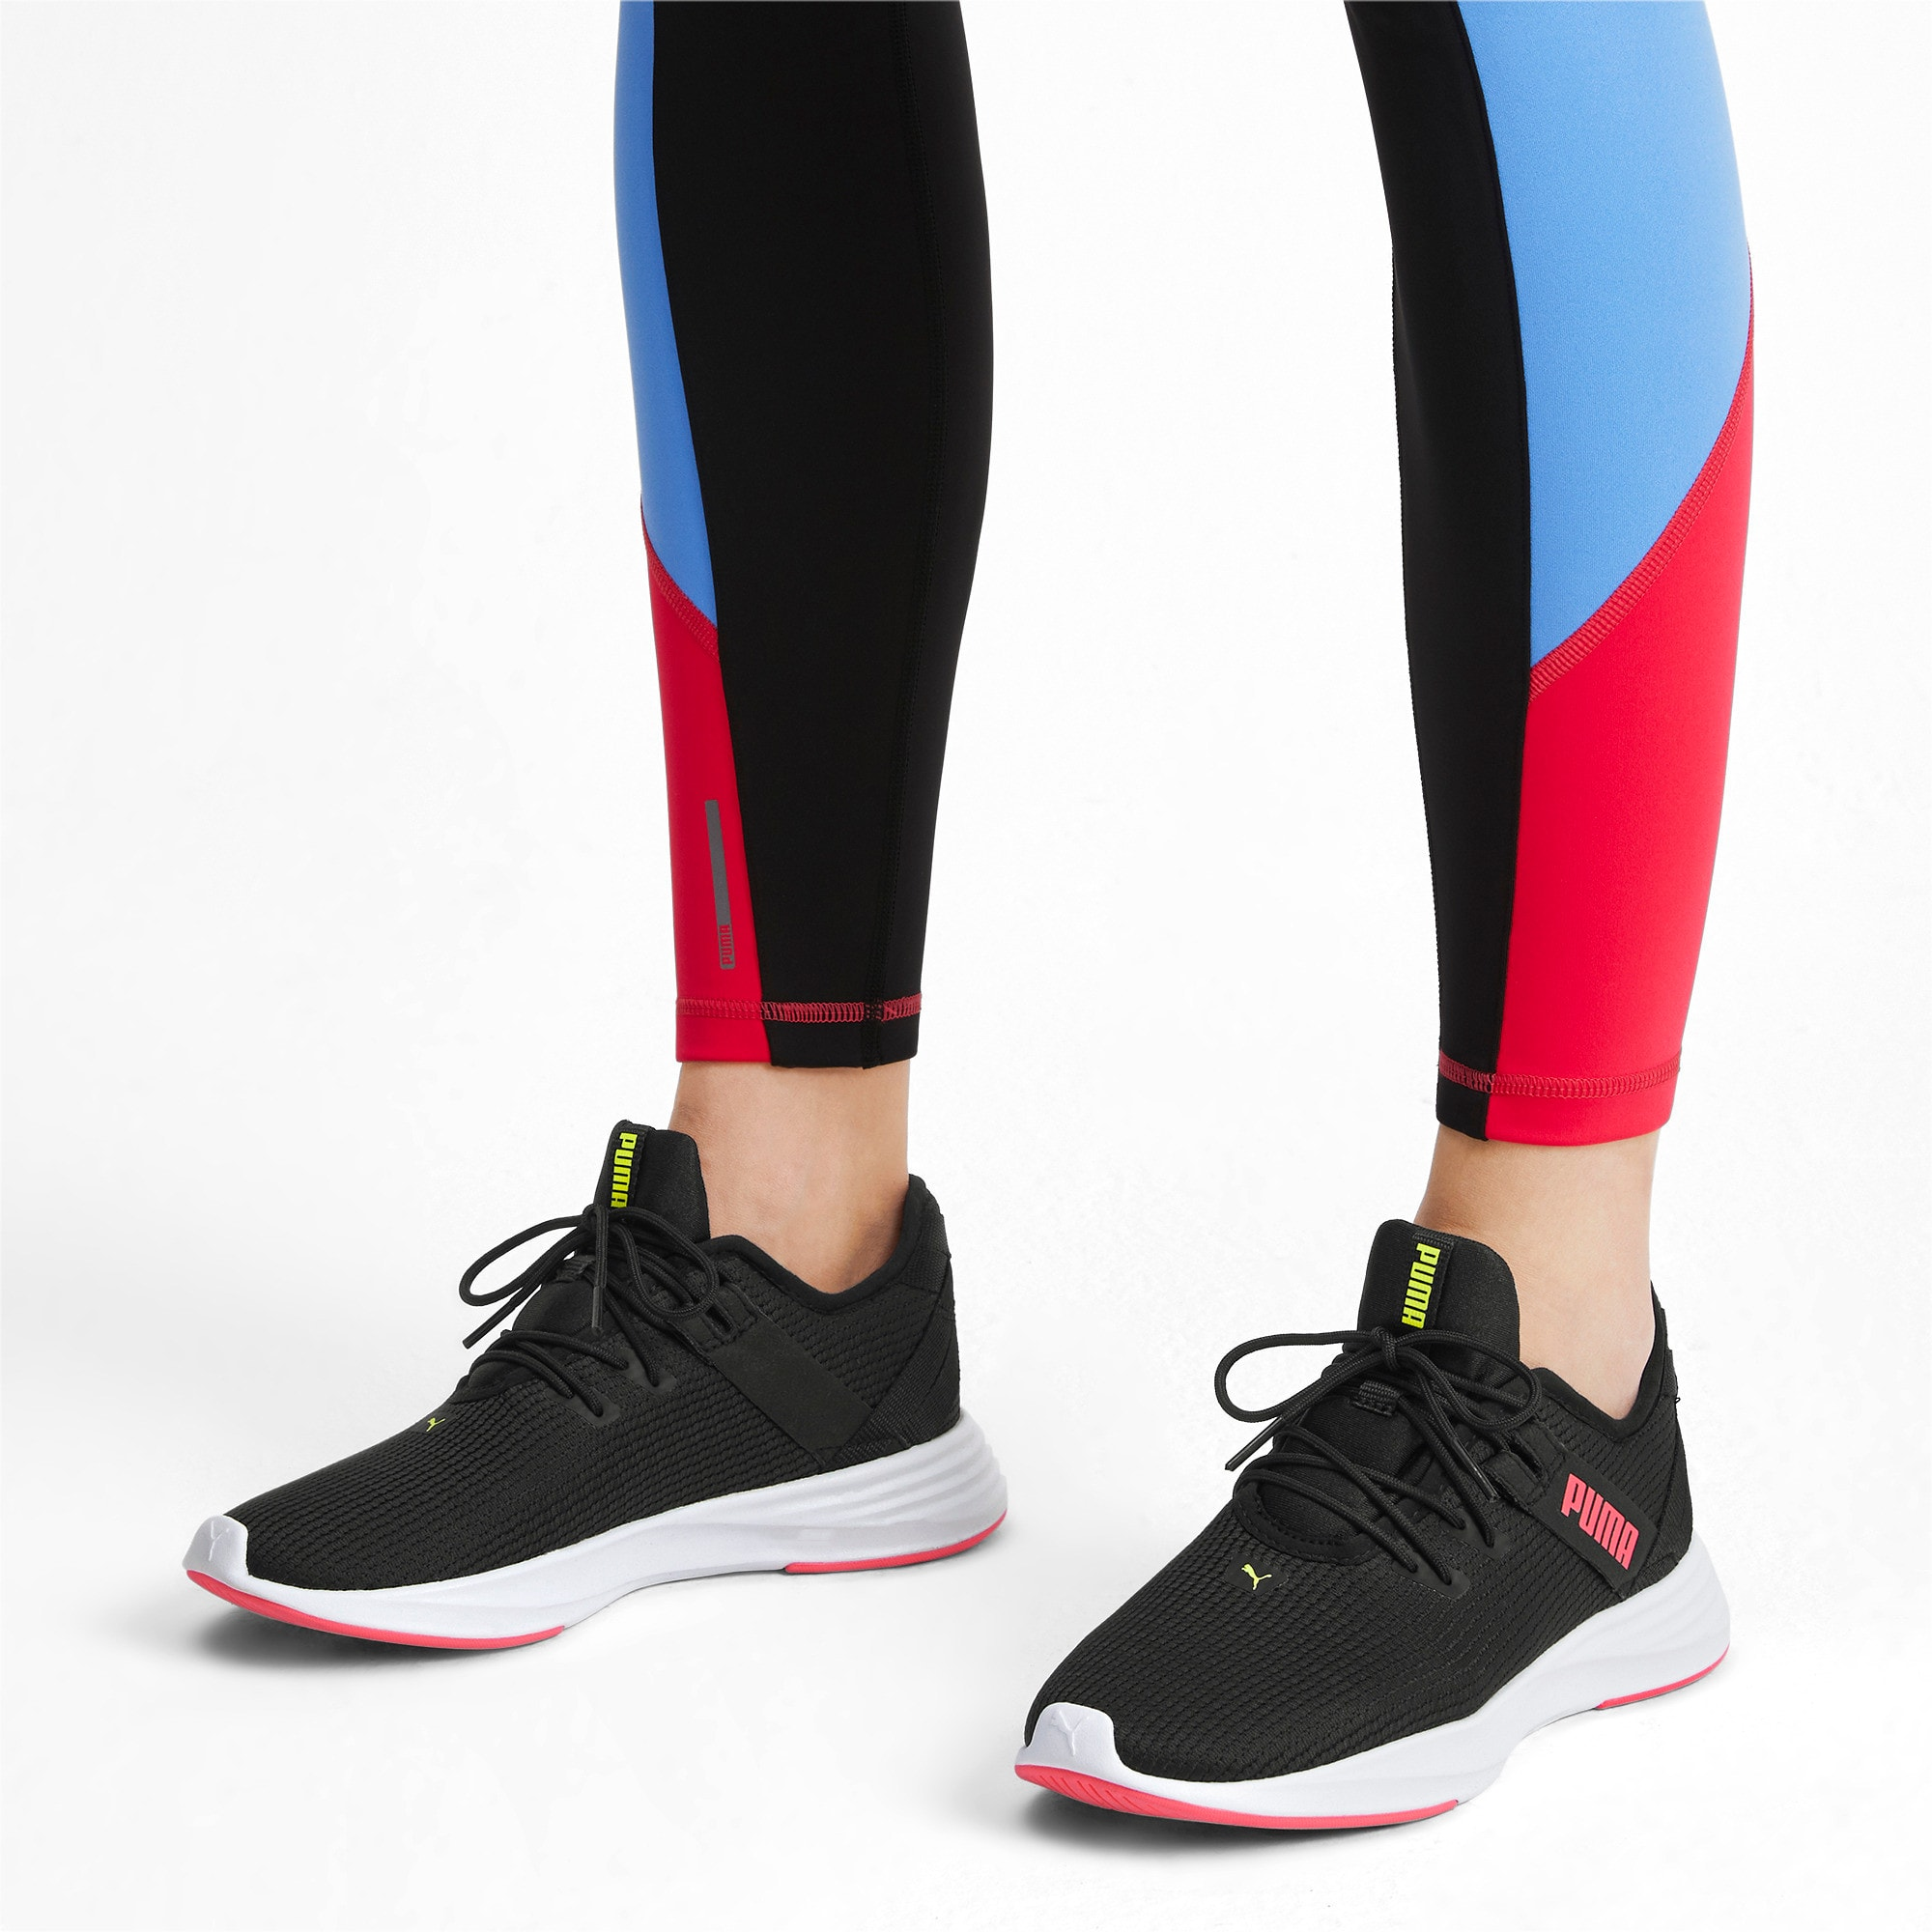 Thumbnail 2 of Radiate XT Women's Training Sneakers, Puma Black-Pink Alert, medium-IND